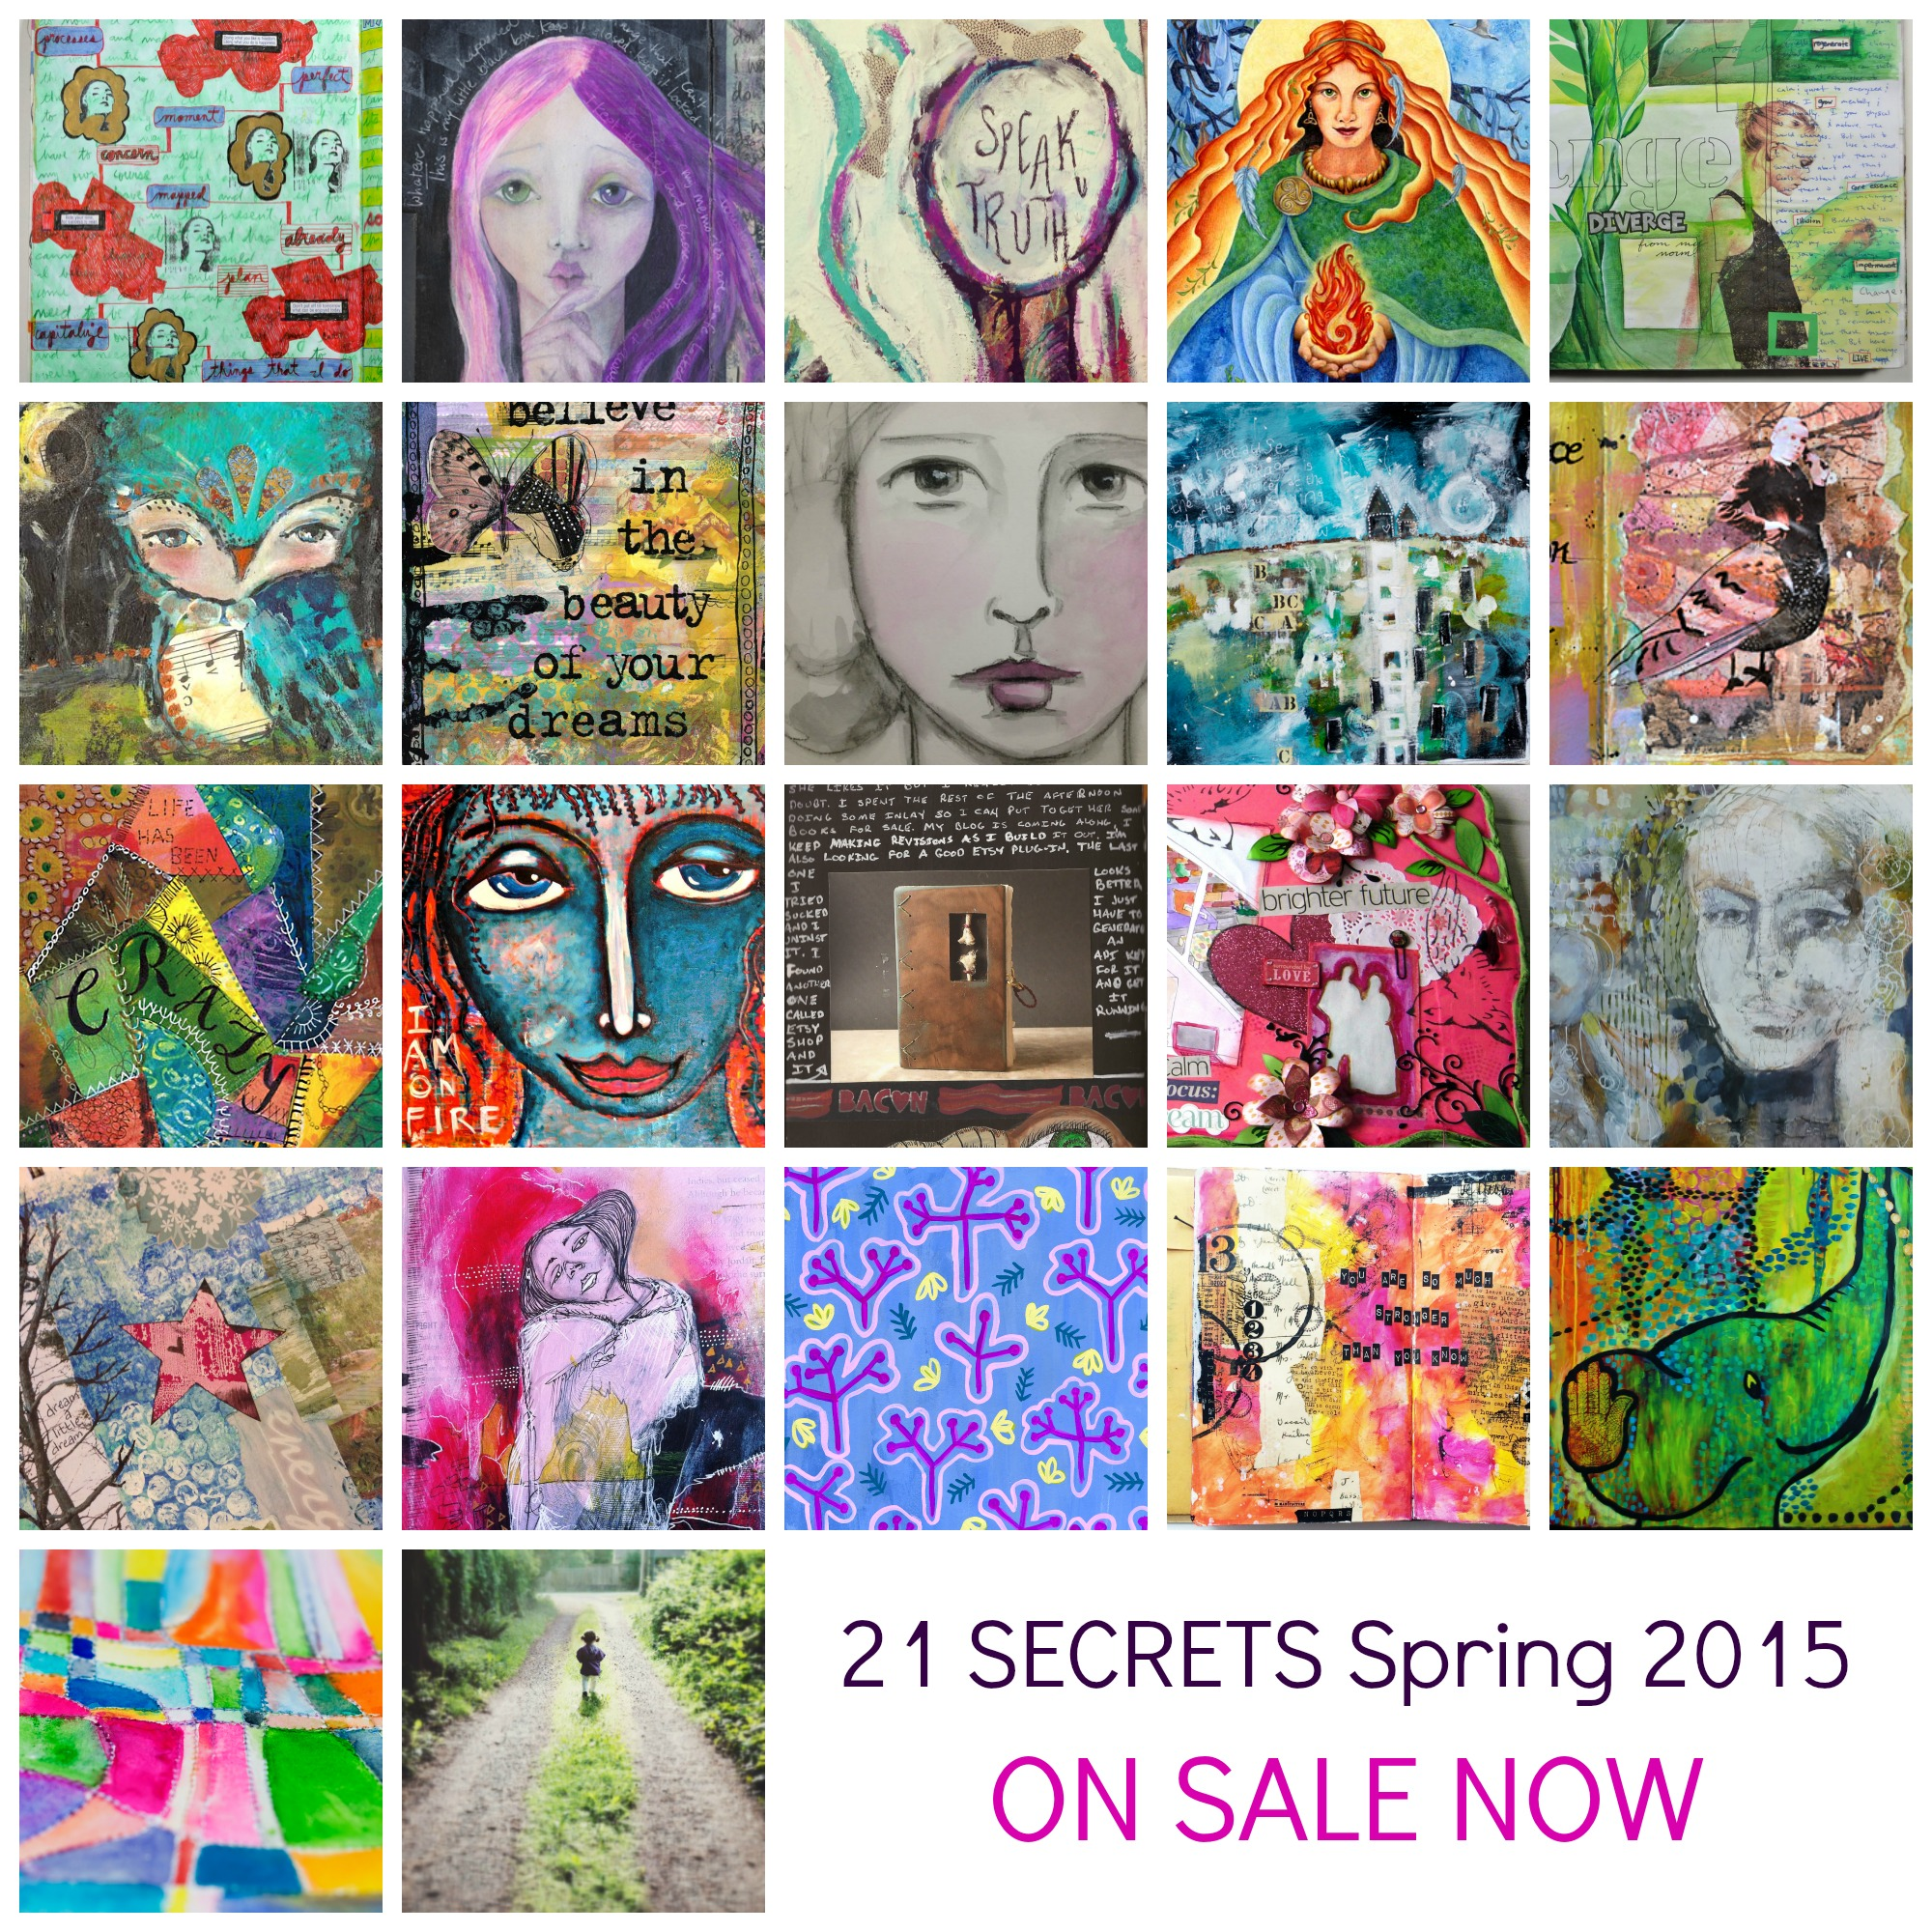 21 SECRETS Spring ART